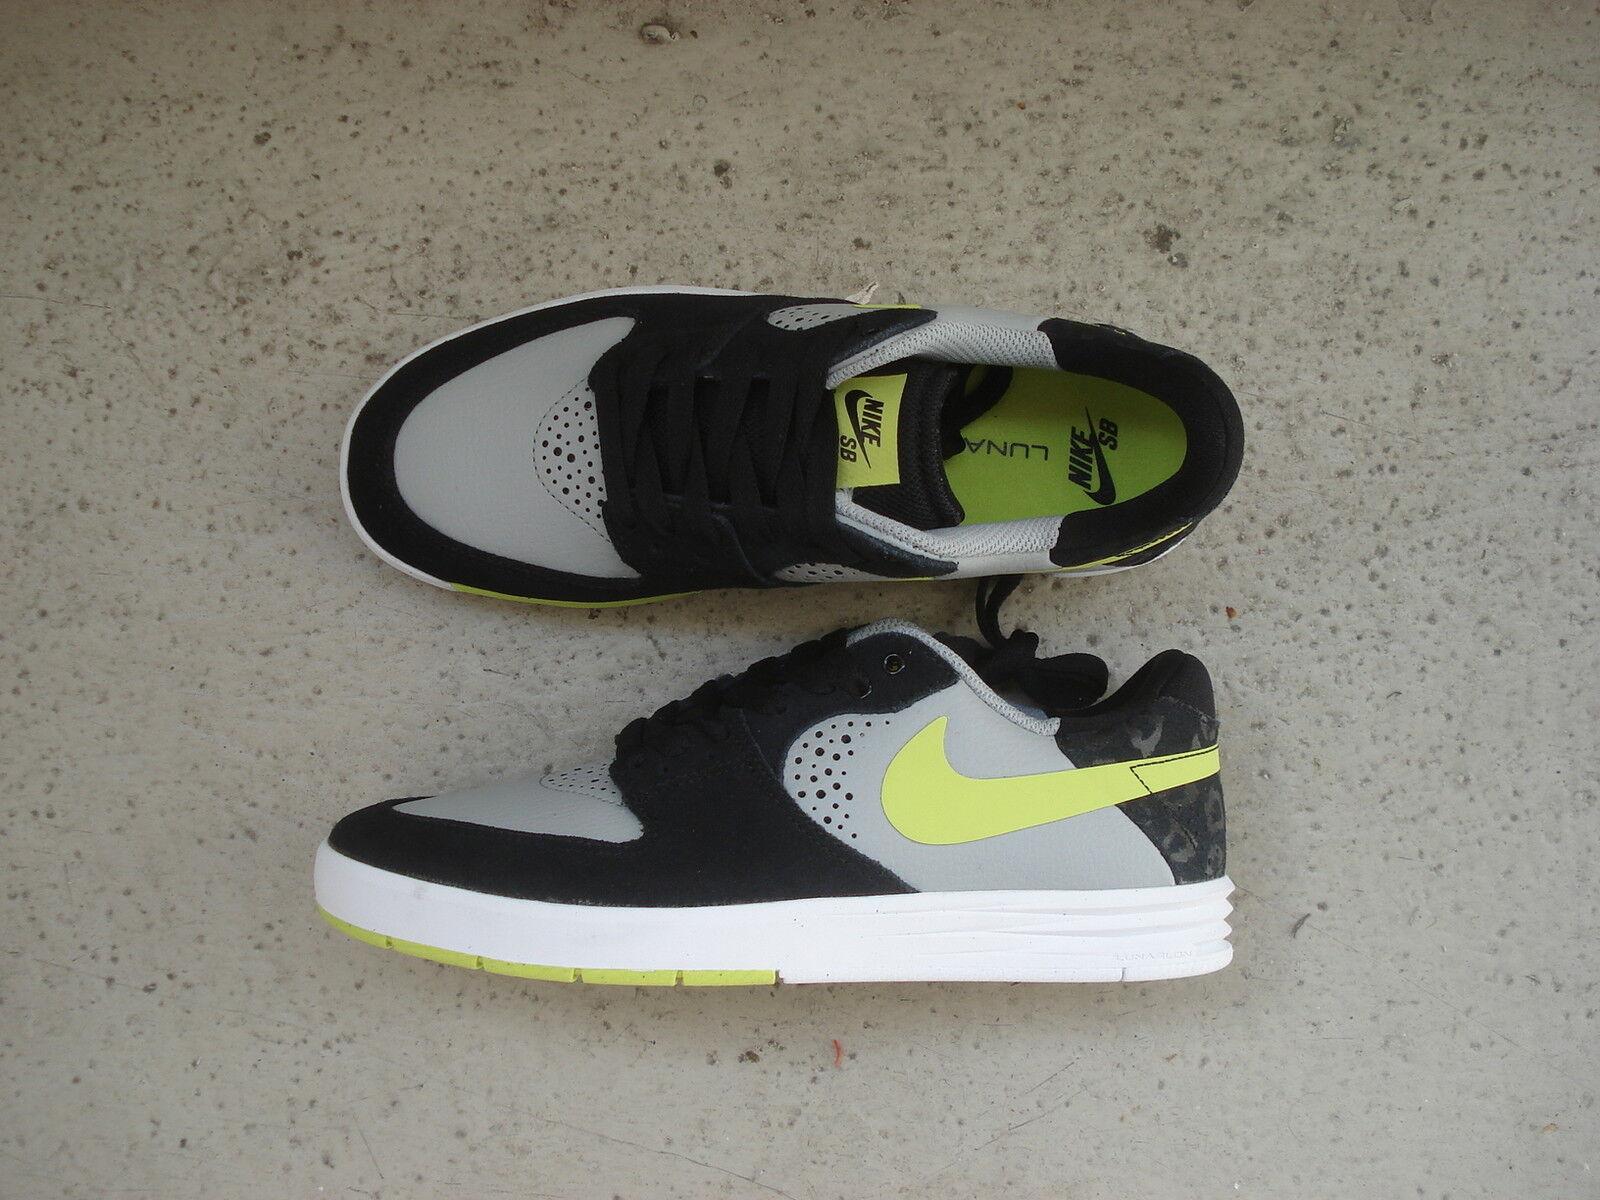 Nike Air Lunar Paul Rodriguez 7 42 Base Grey Venom Green Black